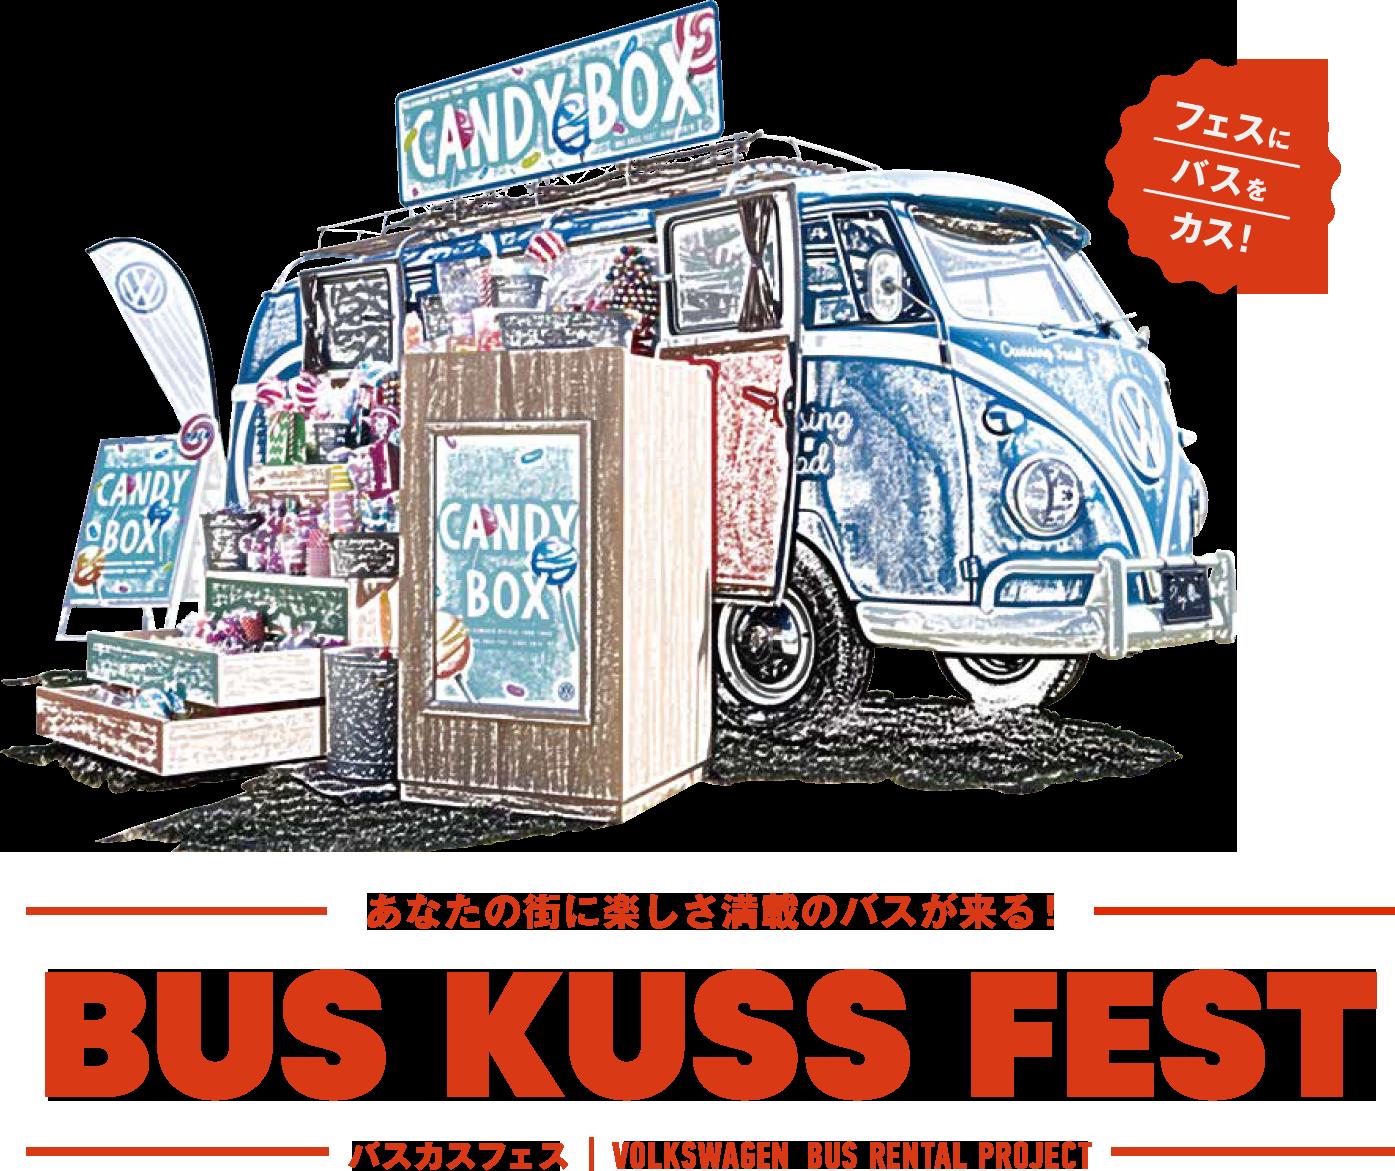 BUS KUSS FEST